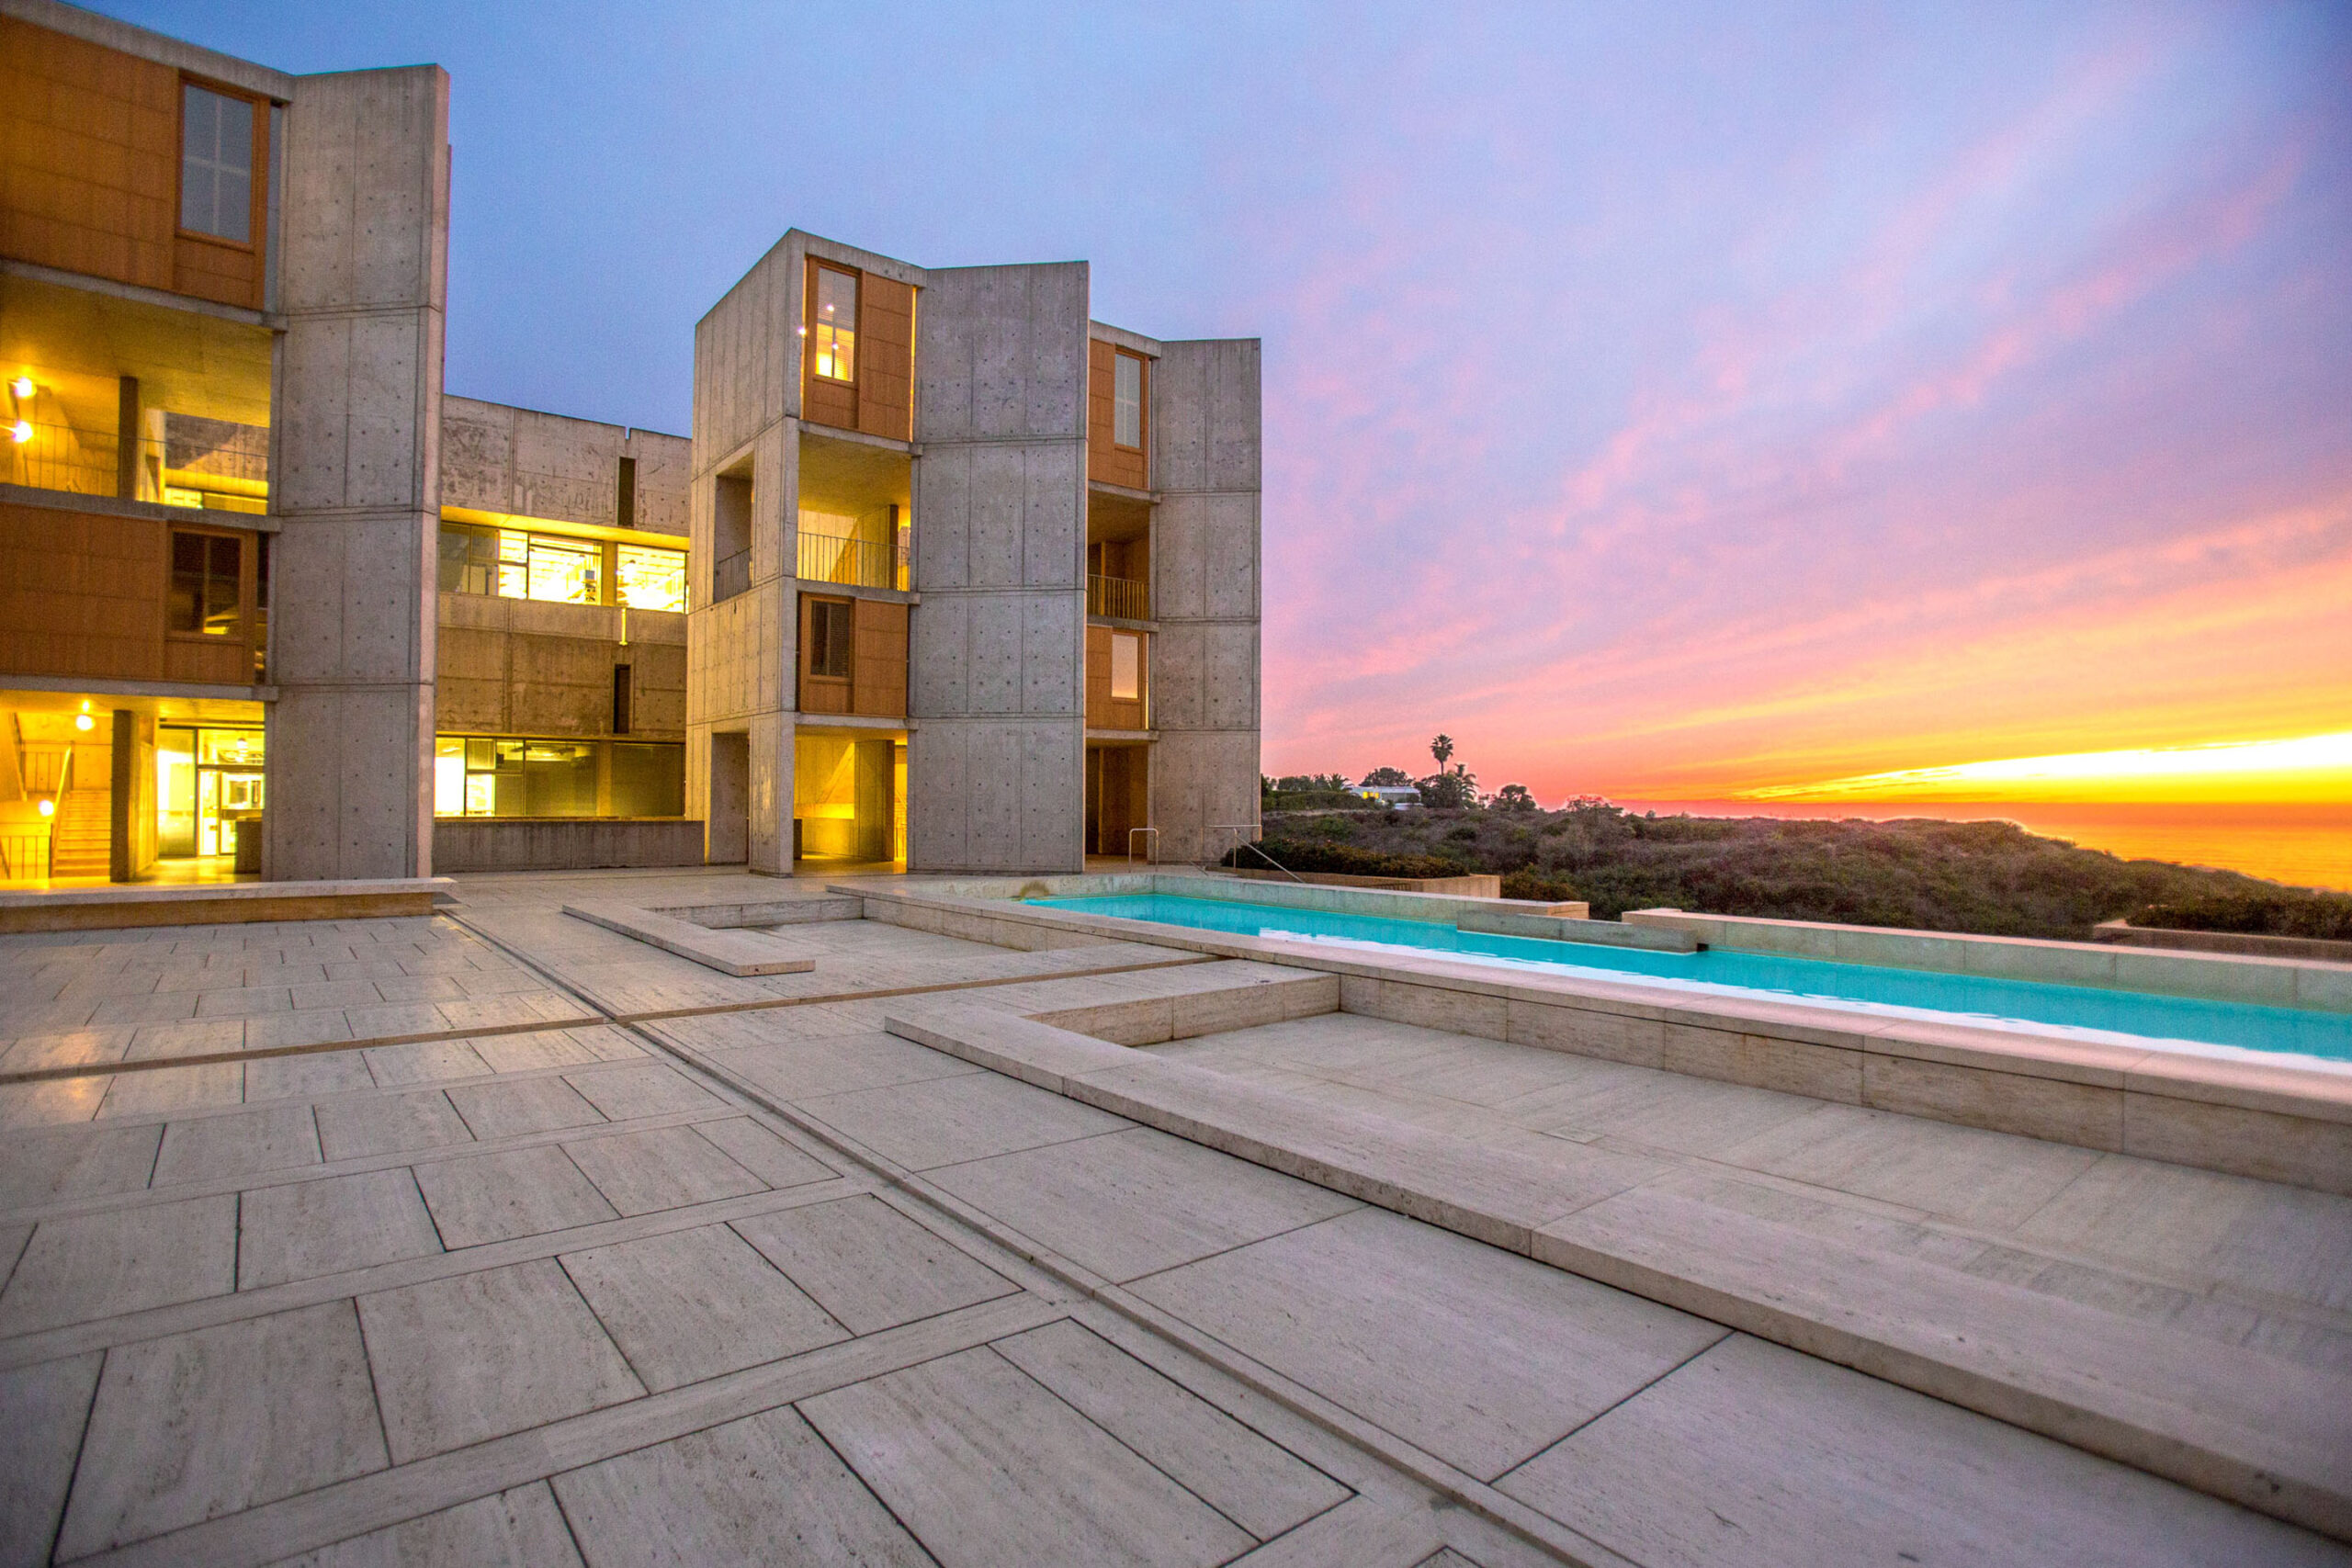 Louis Kahn salk institute sunset photo